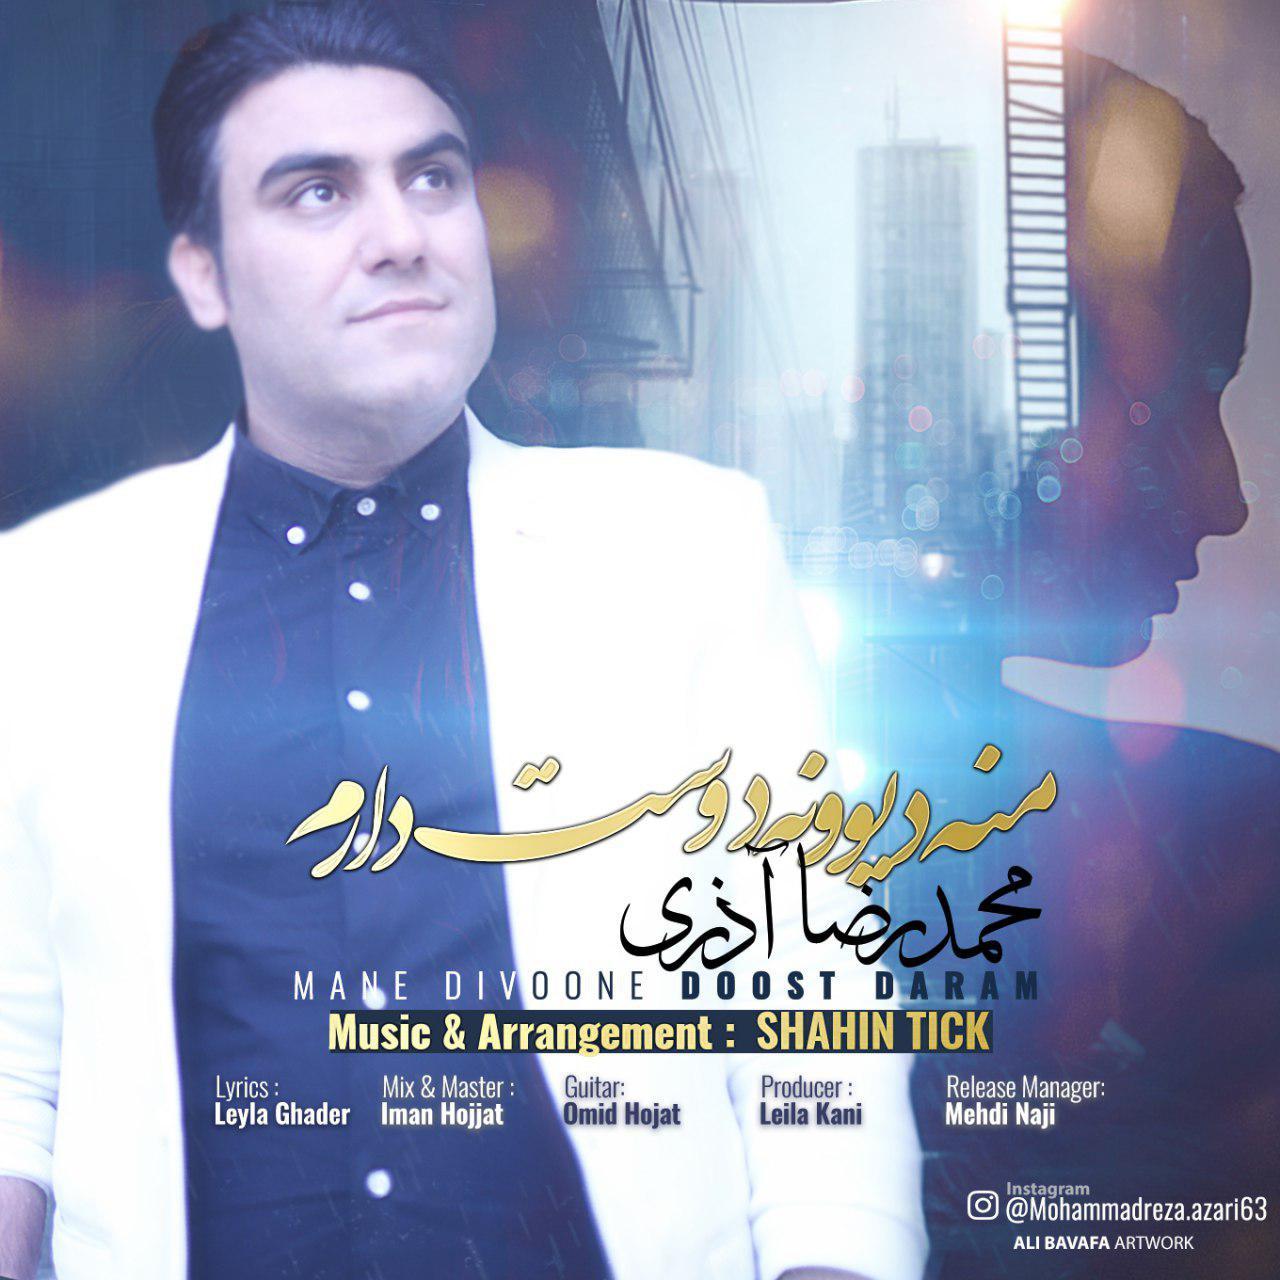 Mohammadreza Azari - Mane Divoone Doost Daram